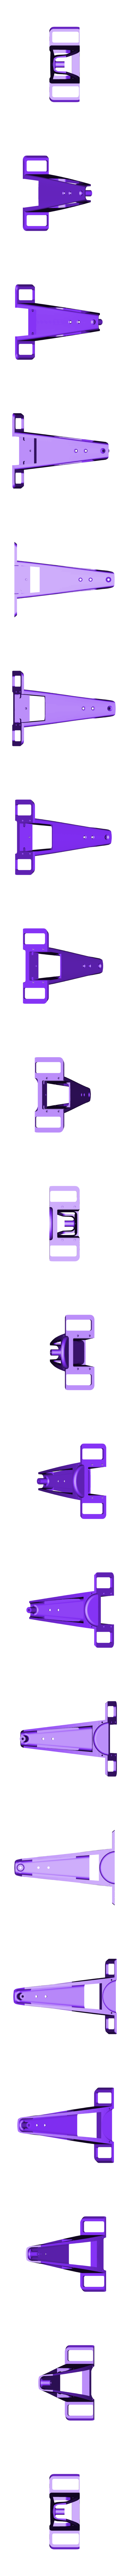 black nose front.stl Download free STL file Aryton Senna's Mclaren MP4/6 3d Printed RC F1 Car • 3D printing design, brett